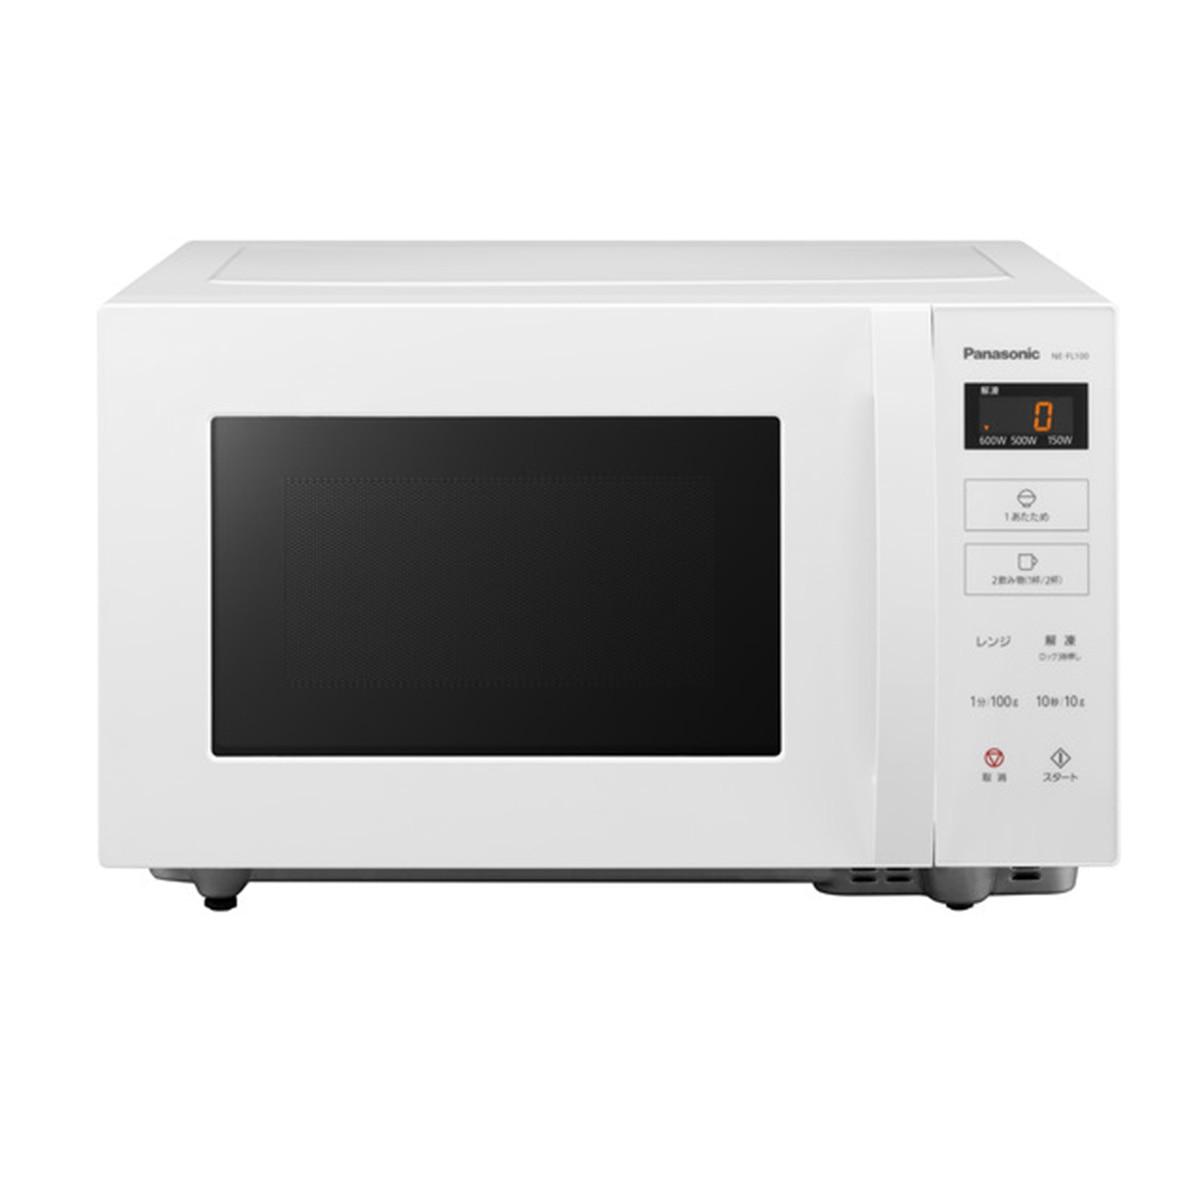 Panasonic 単機能レンジ (ホワイト) NE-FL100-W